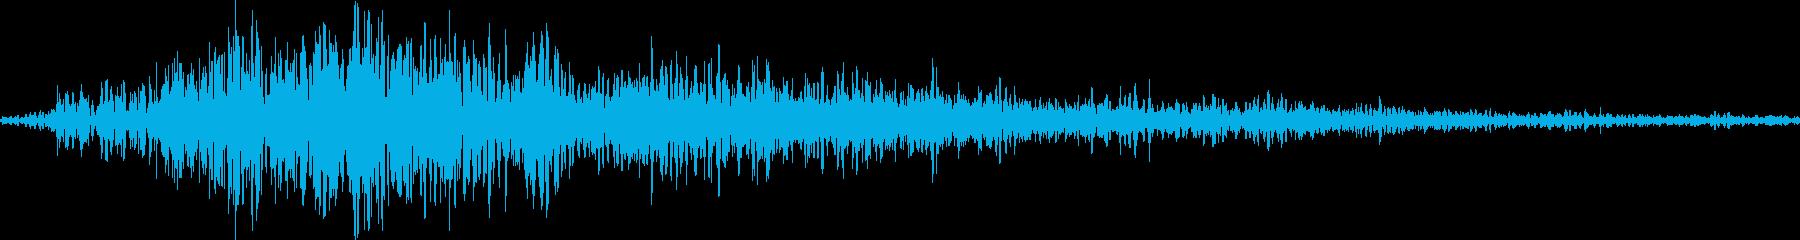 RPG:魔法詠唱「シュワンッ」の再生済みの波形